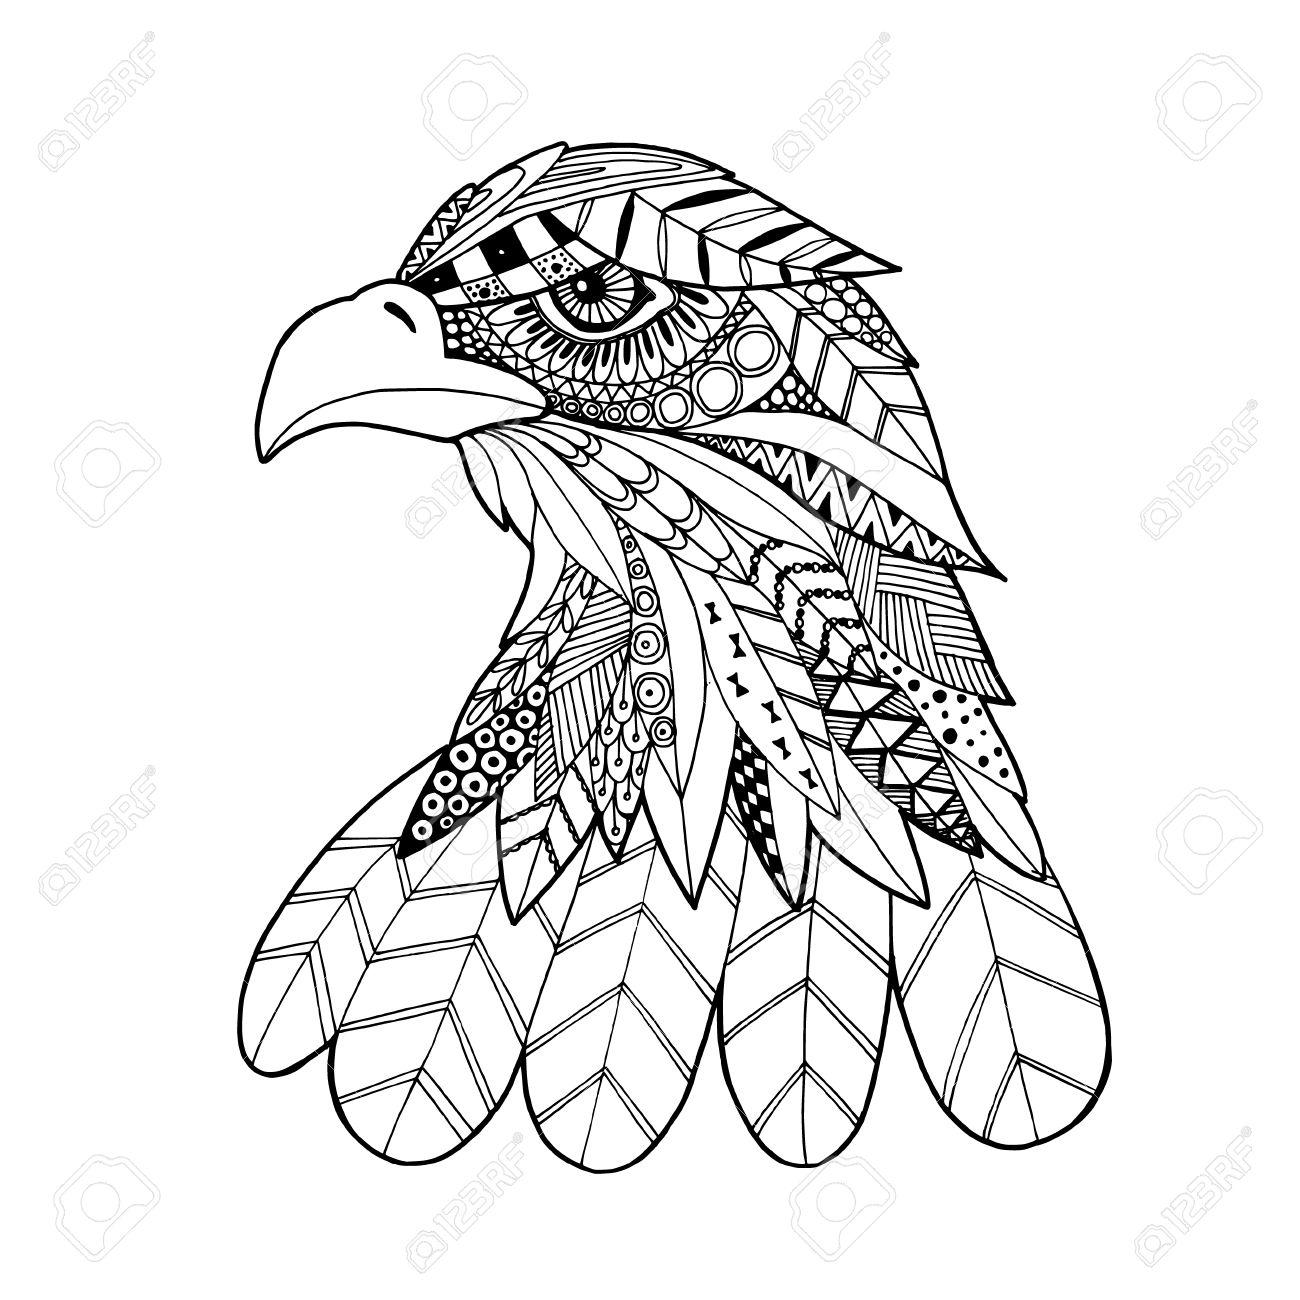 1300x1300 Ornamental Head Of Eagle Bird, Trendy Ethnic Zentangle Style